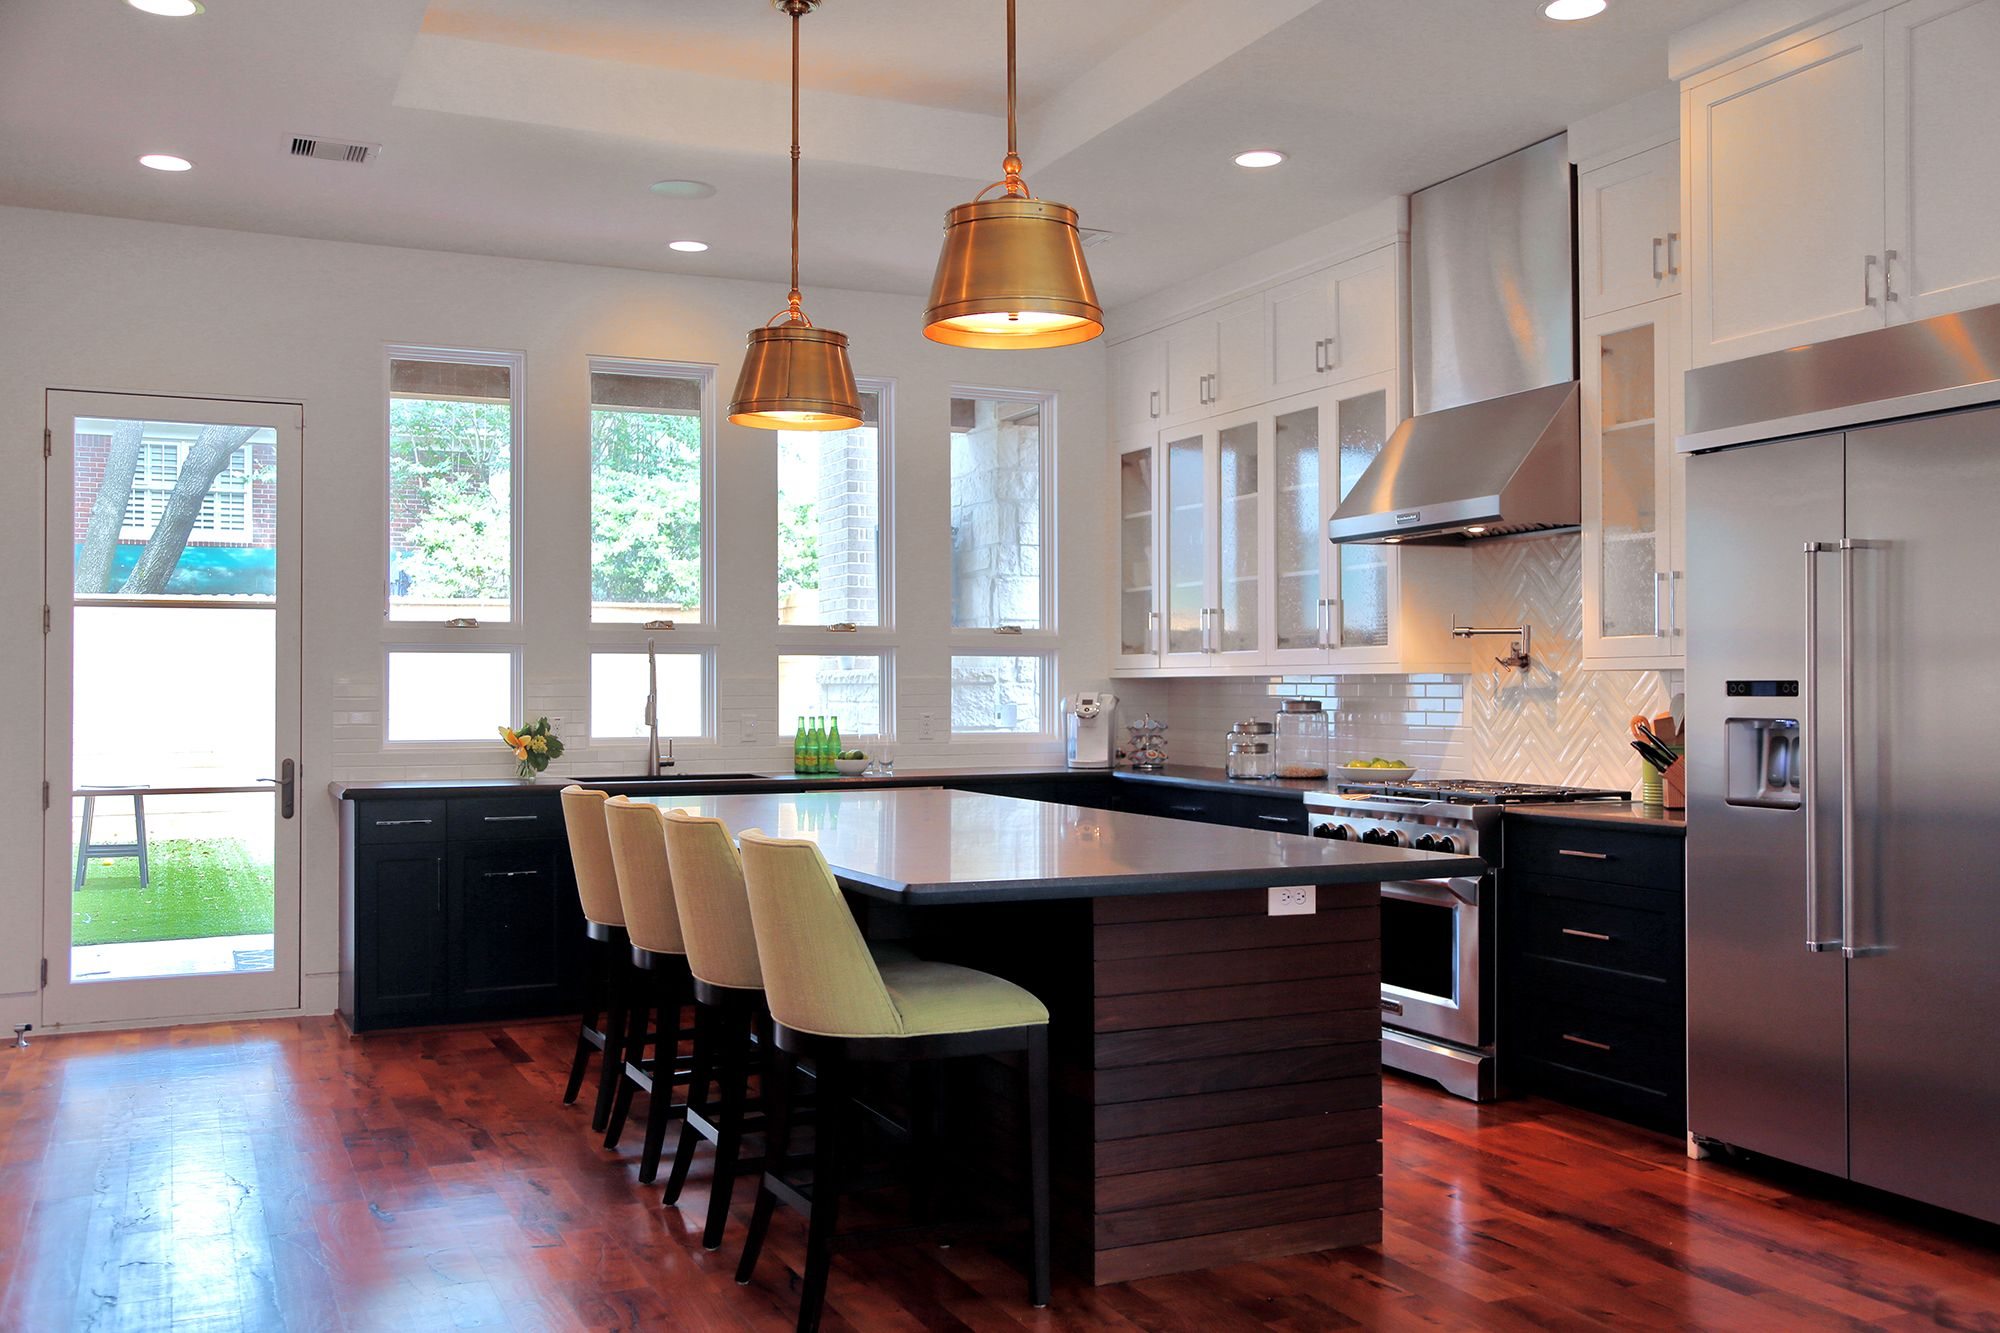 By Design Interiors, Inc. Houston Interior Design Firm